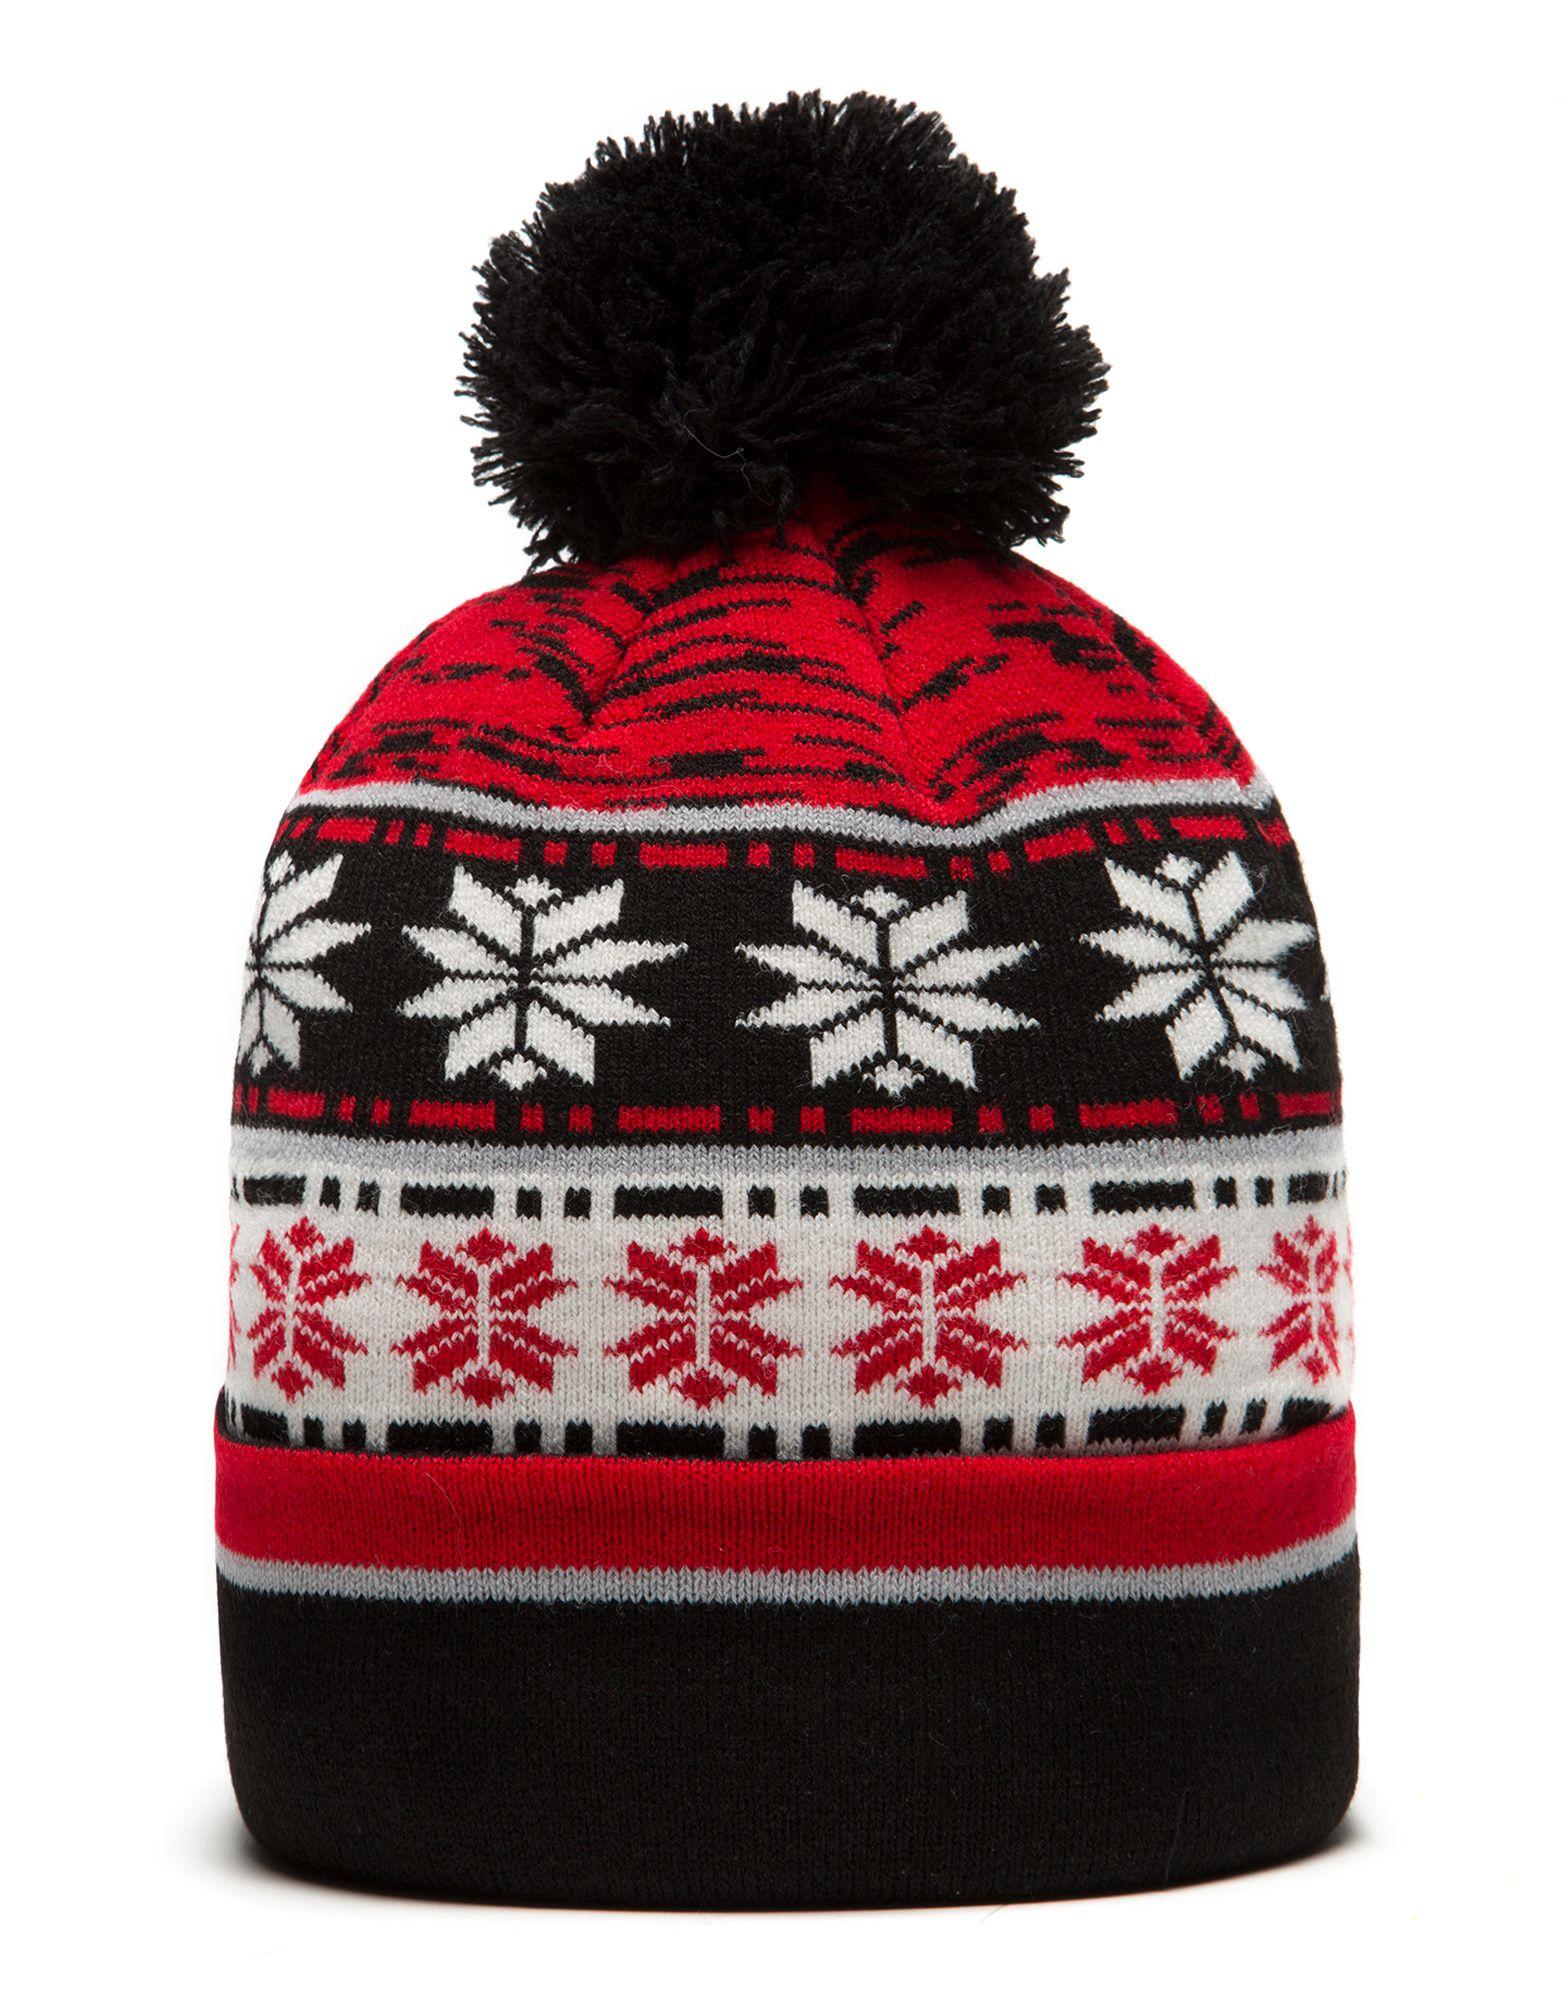 New Era NHL Chicago Blackhawks Blizzard Bobble Hat